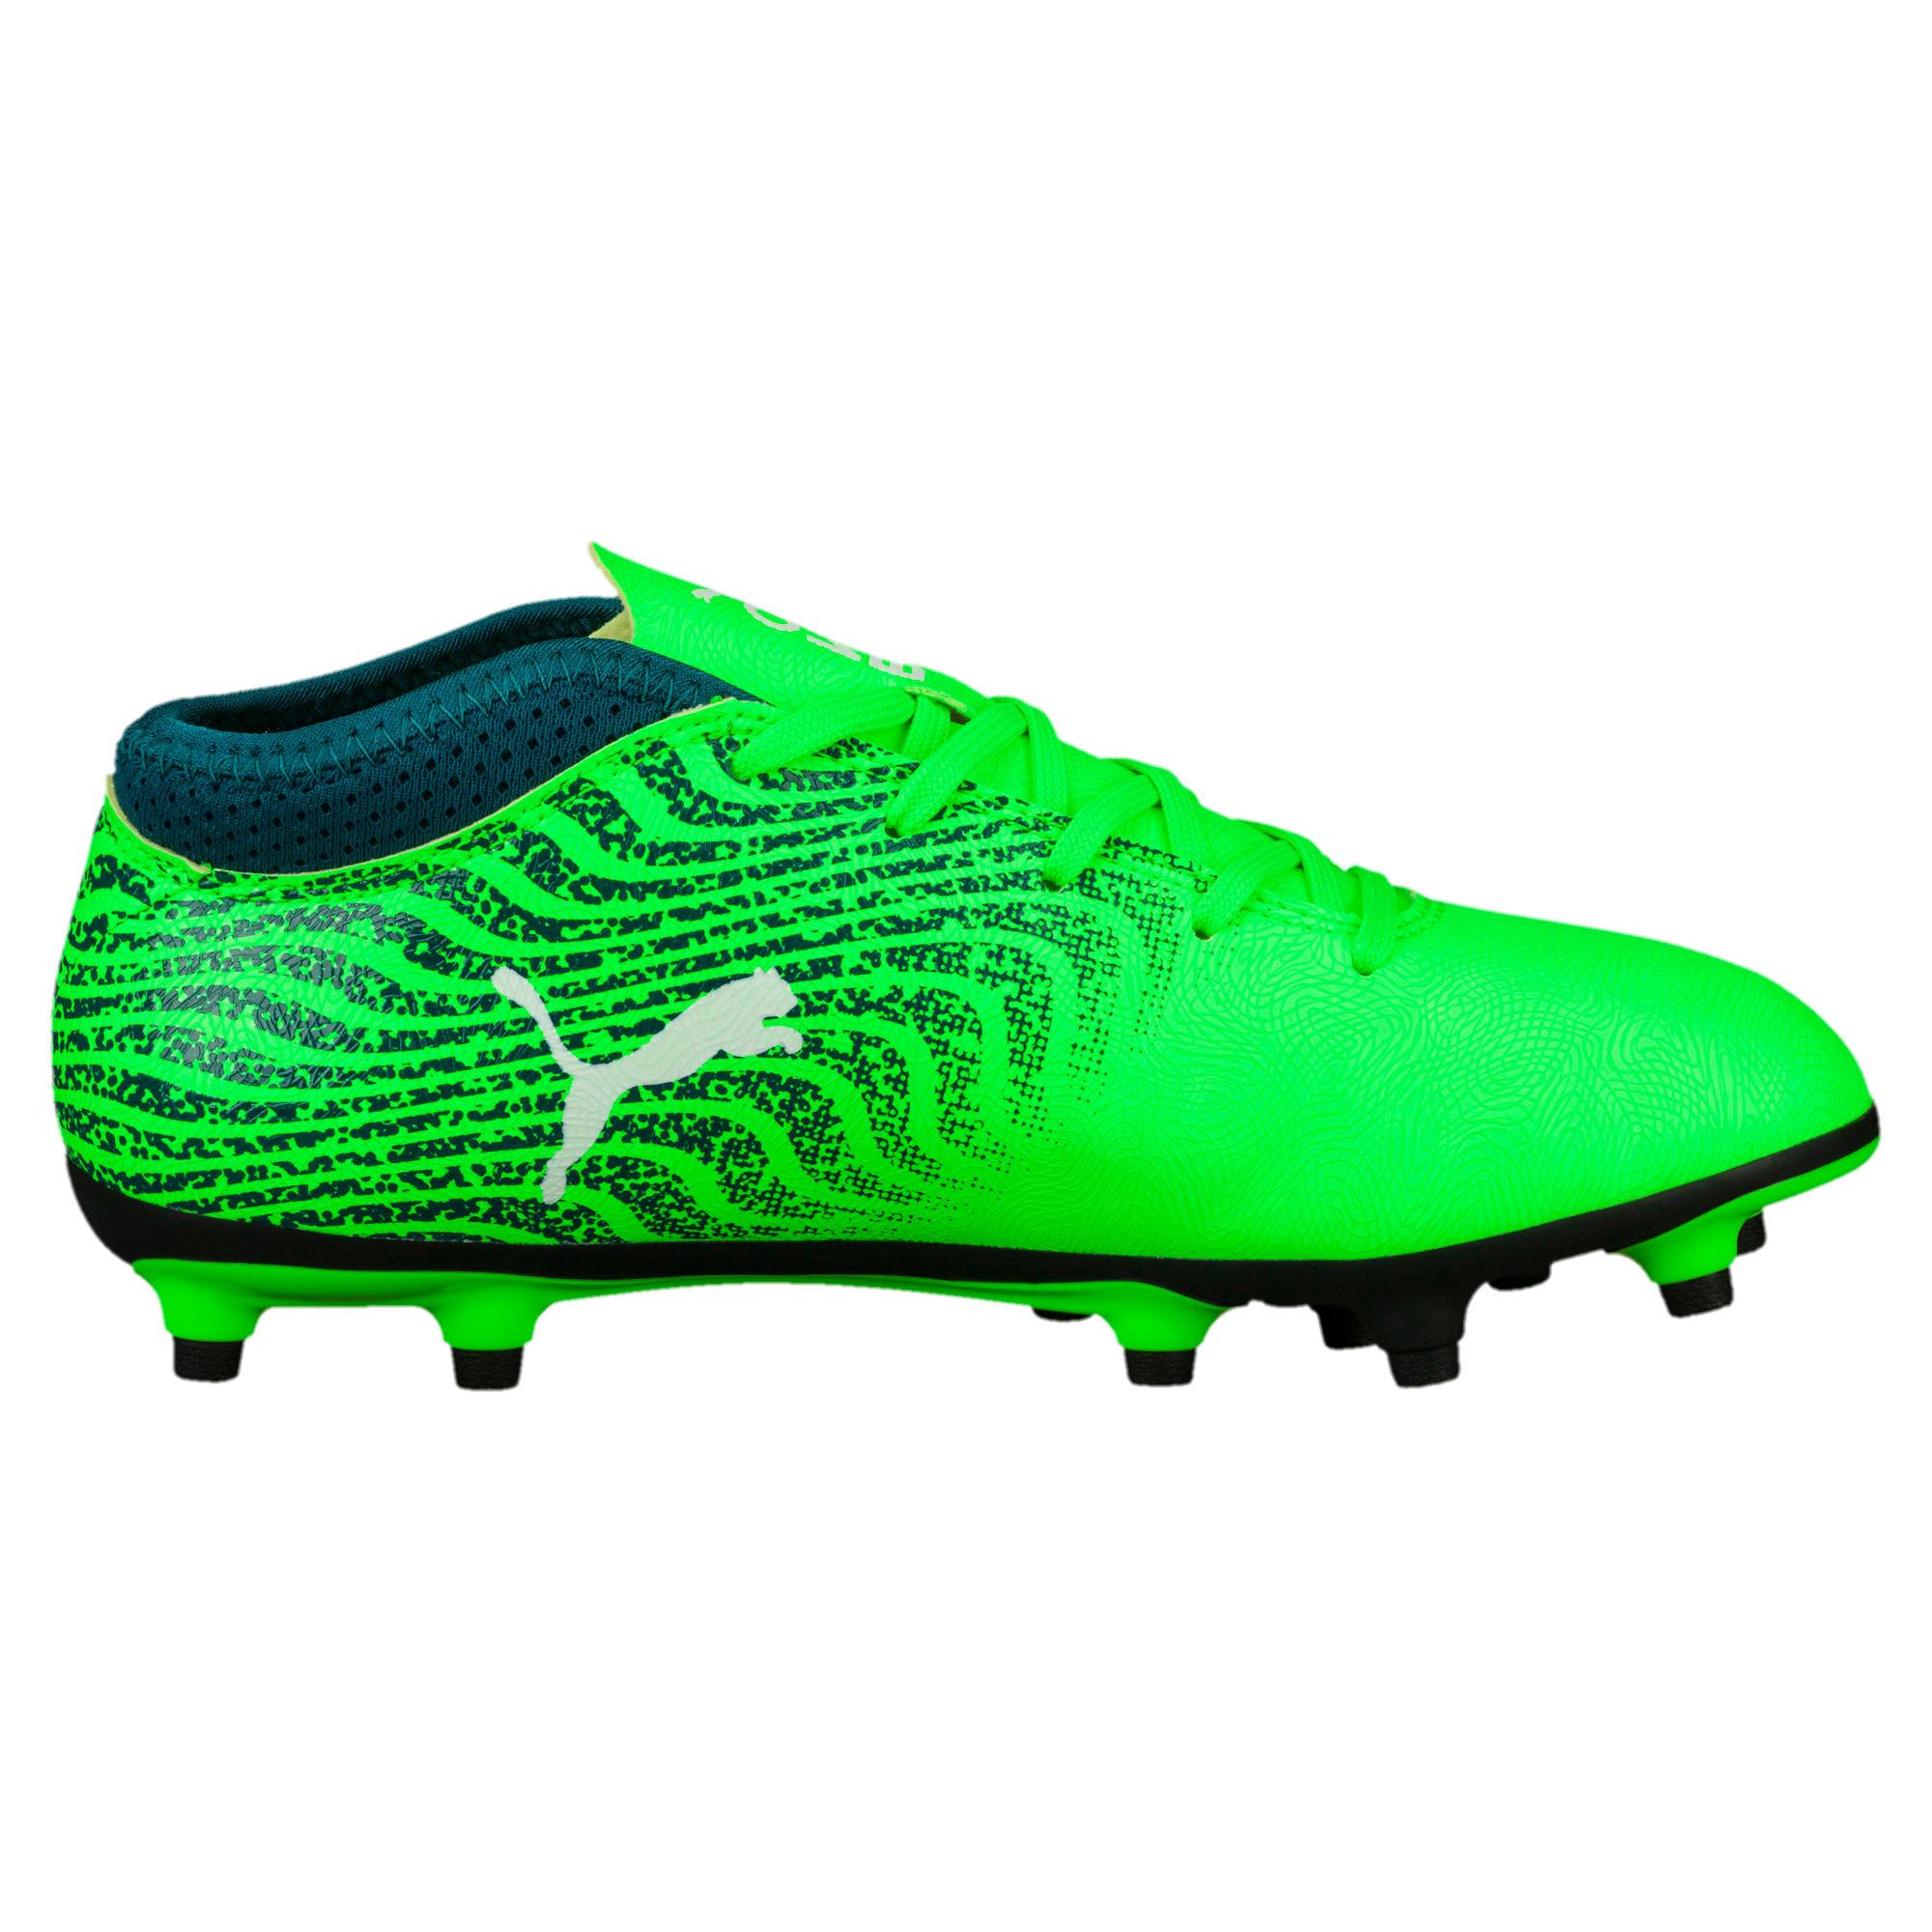 Thumbnail 3 of ONE 18.4 FG Kids' Football Boots, Green-White-Deep Lagoon, medium-IND